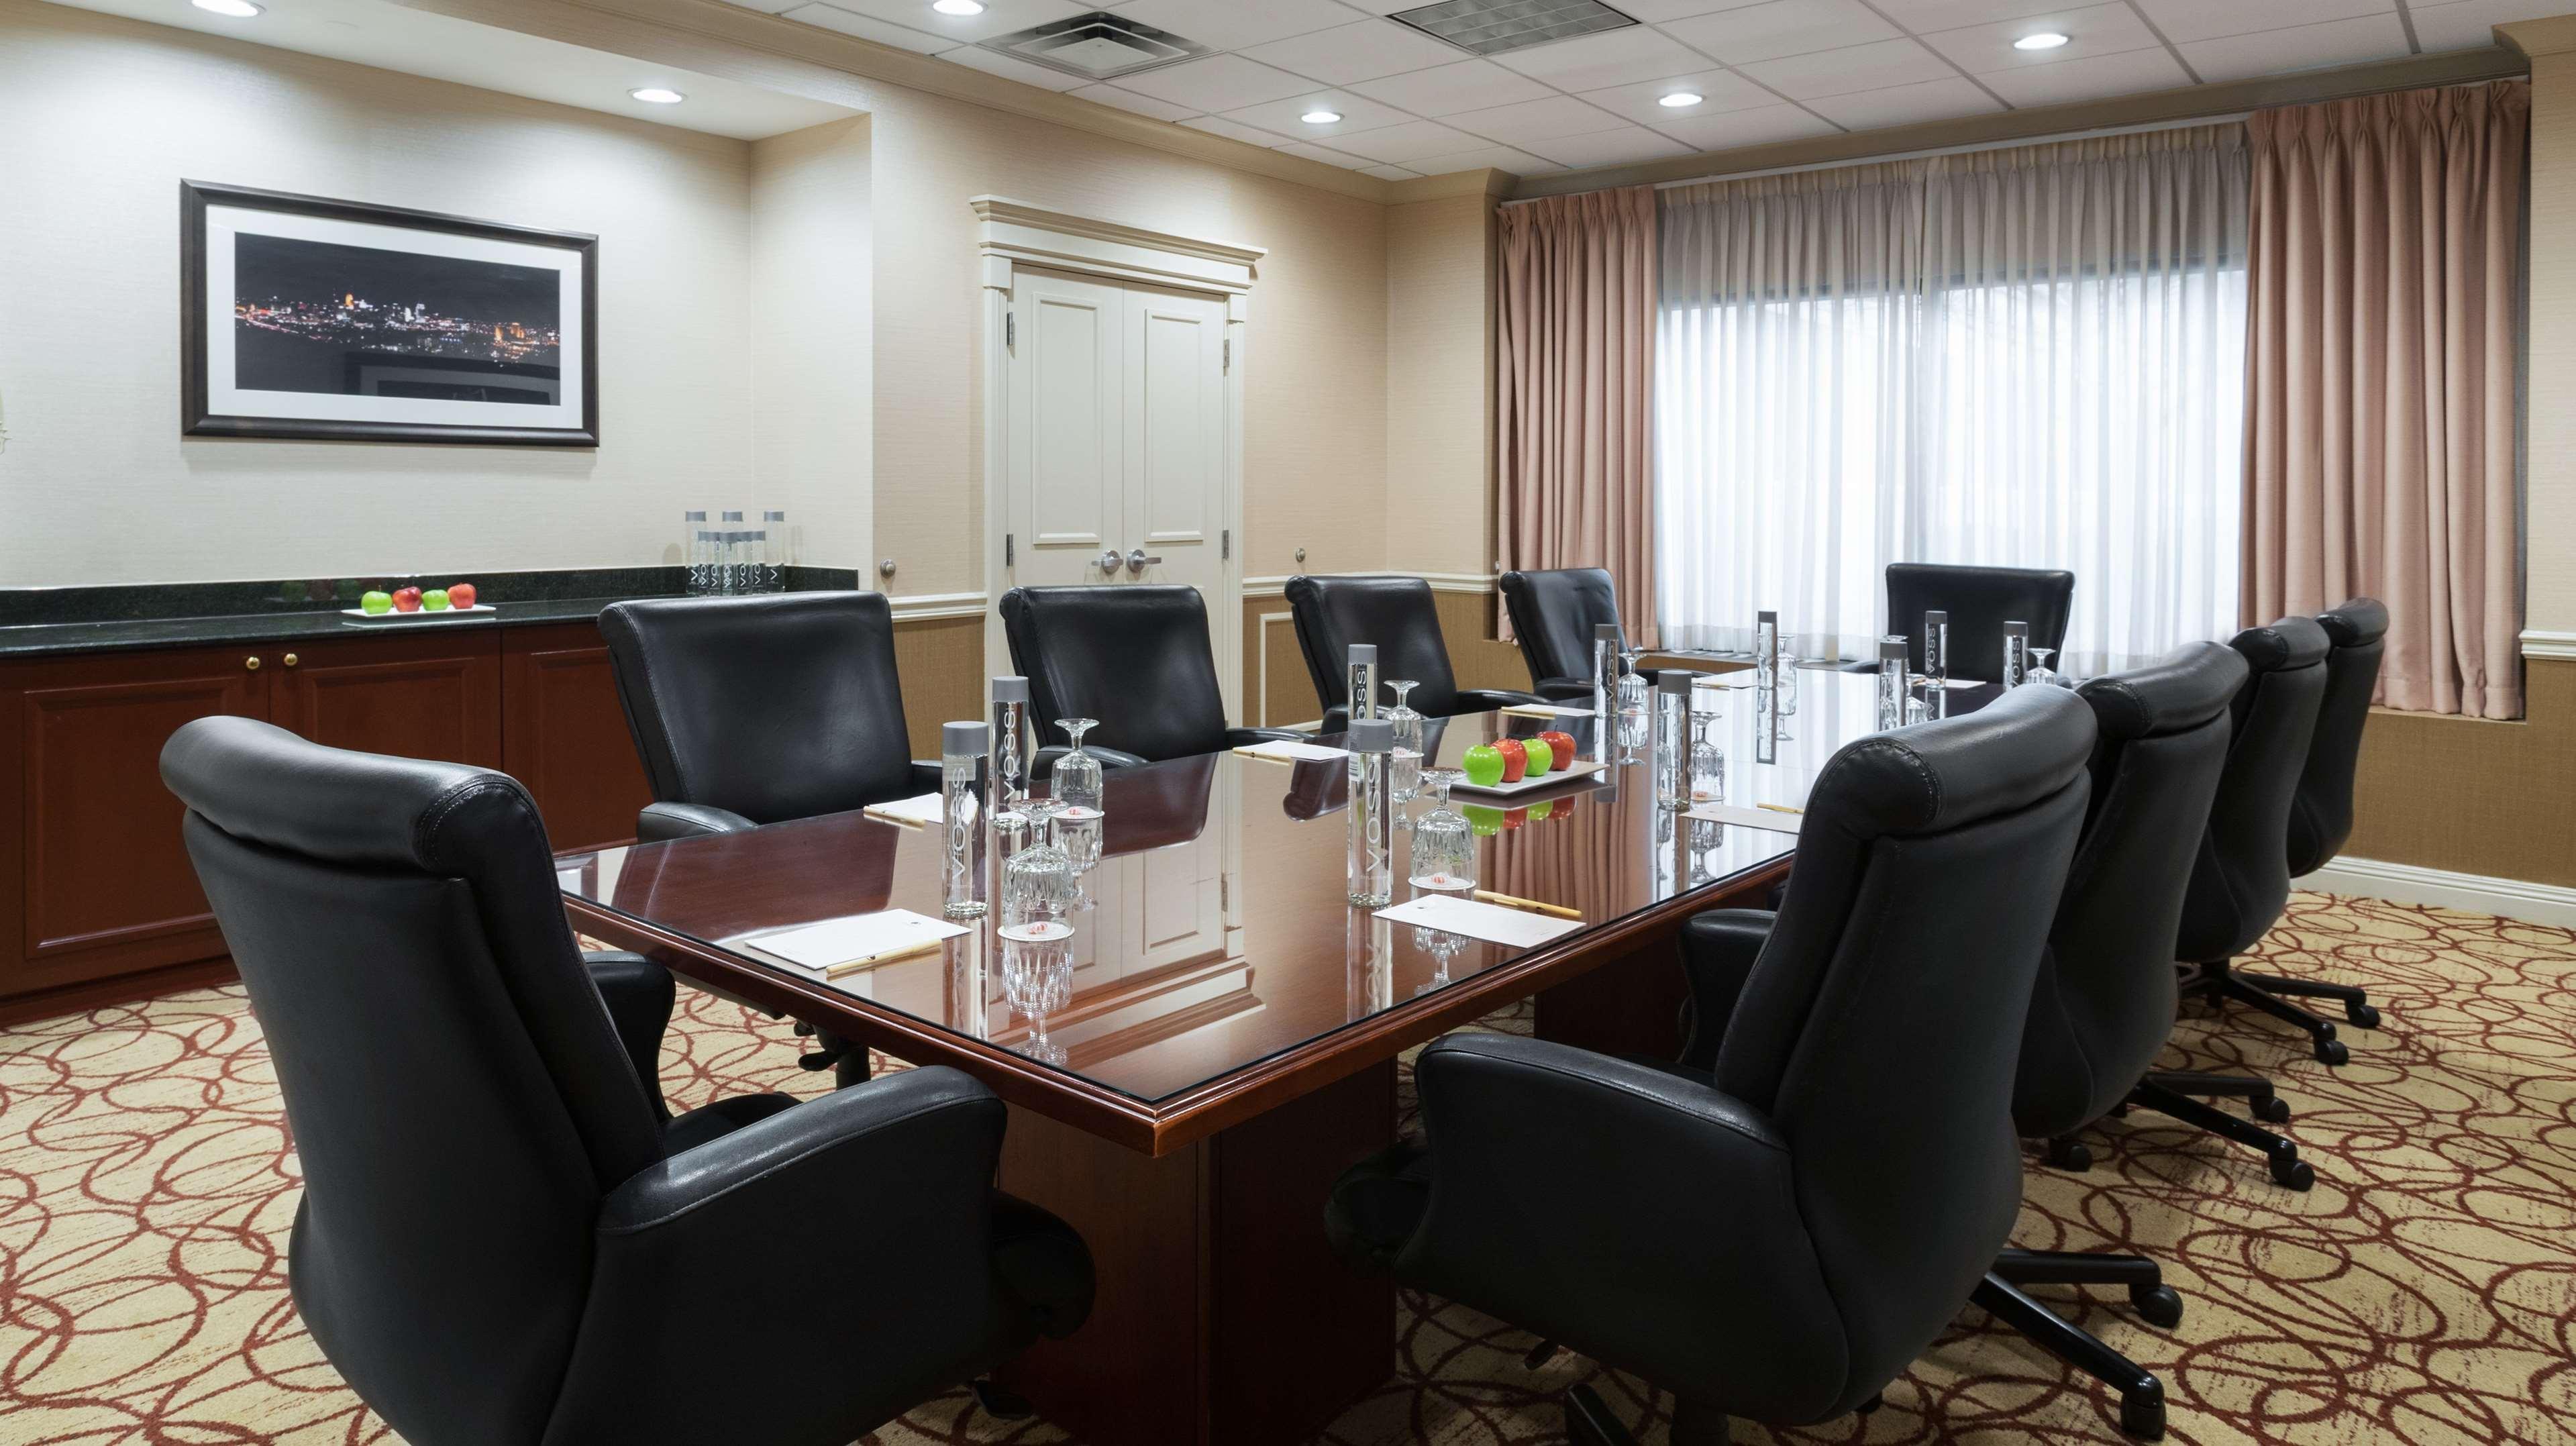 DoubleTree Suites by Hilton Hotel Cincinnati - Blue Ash image 9